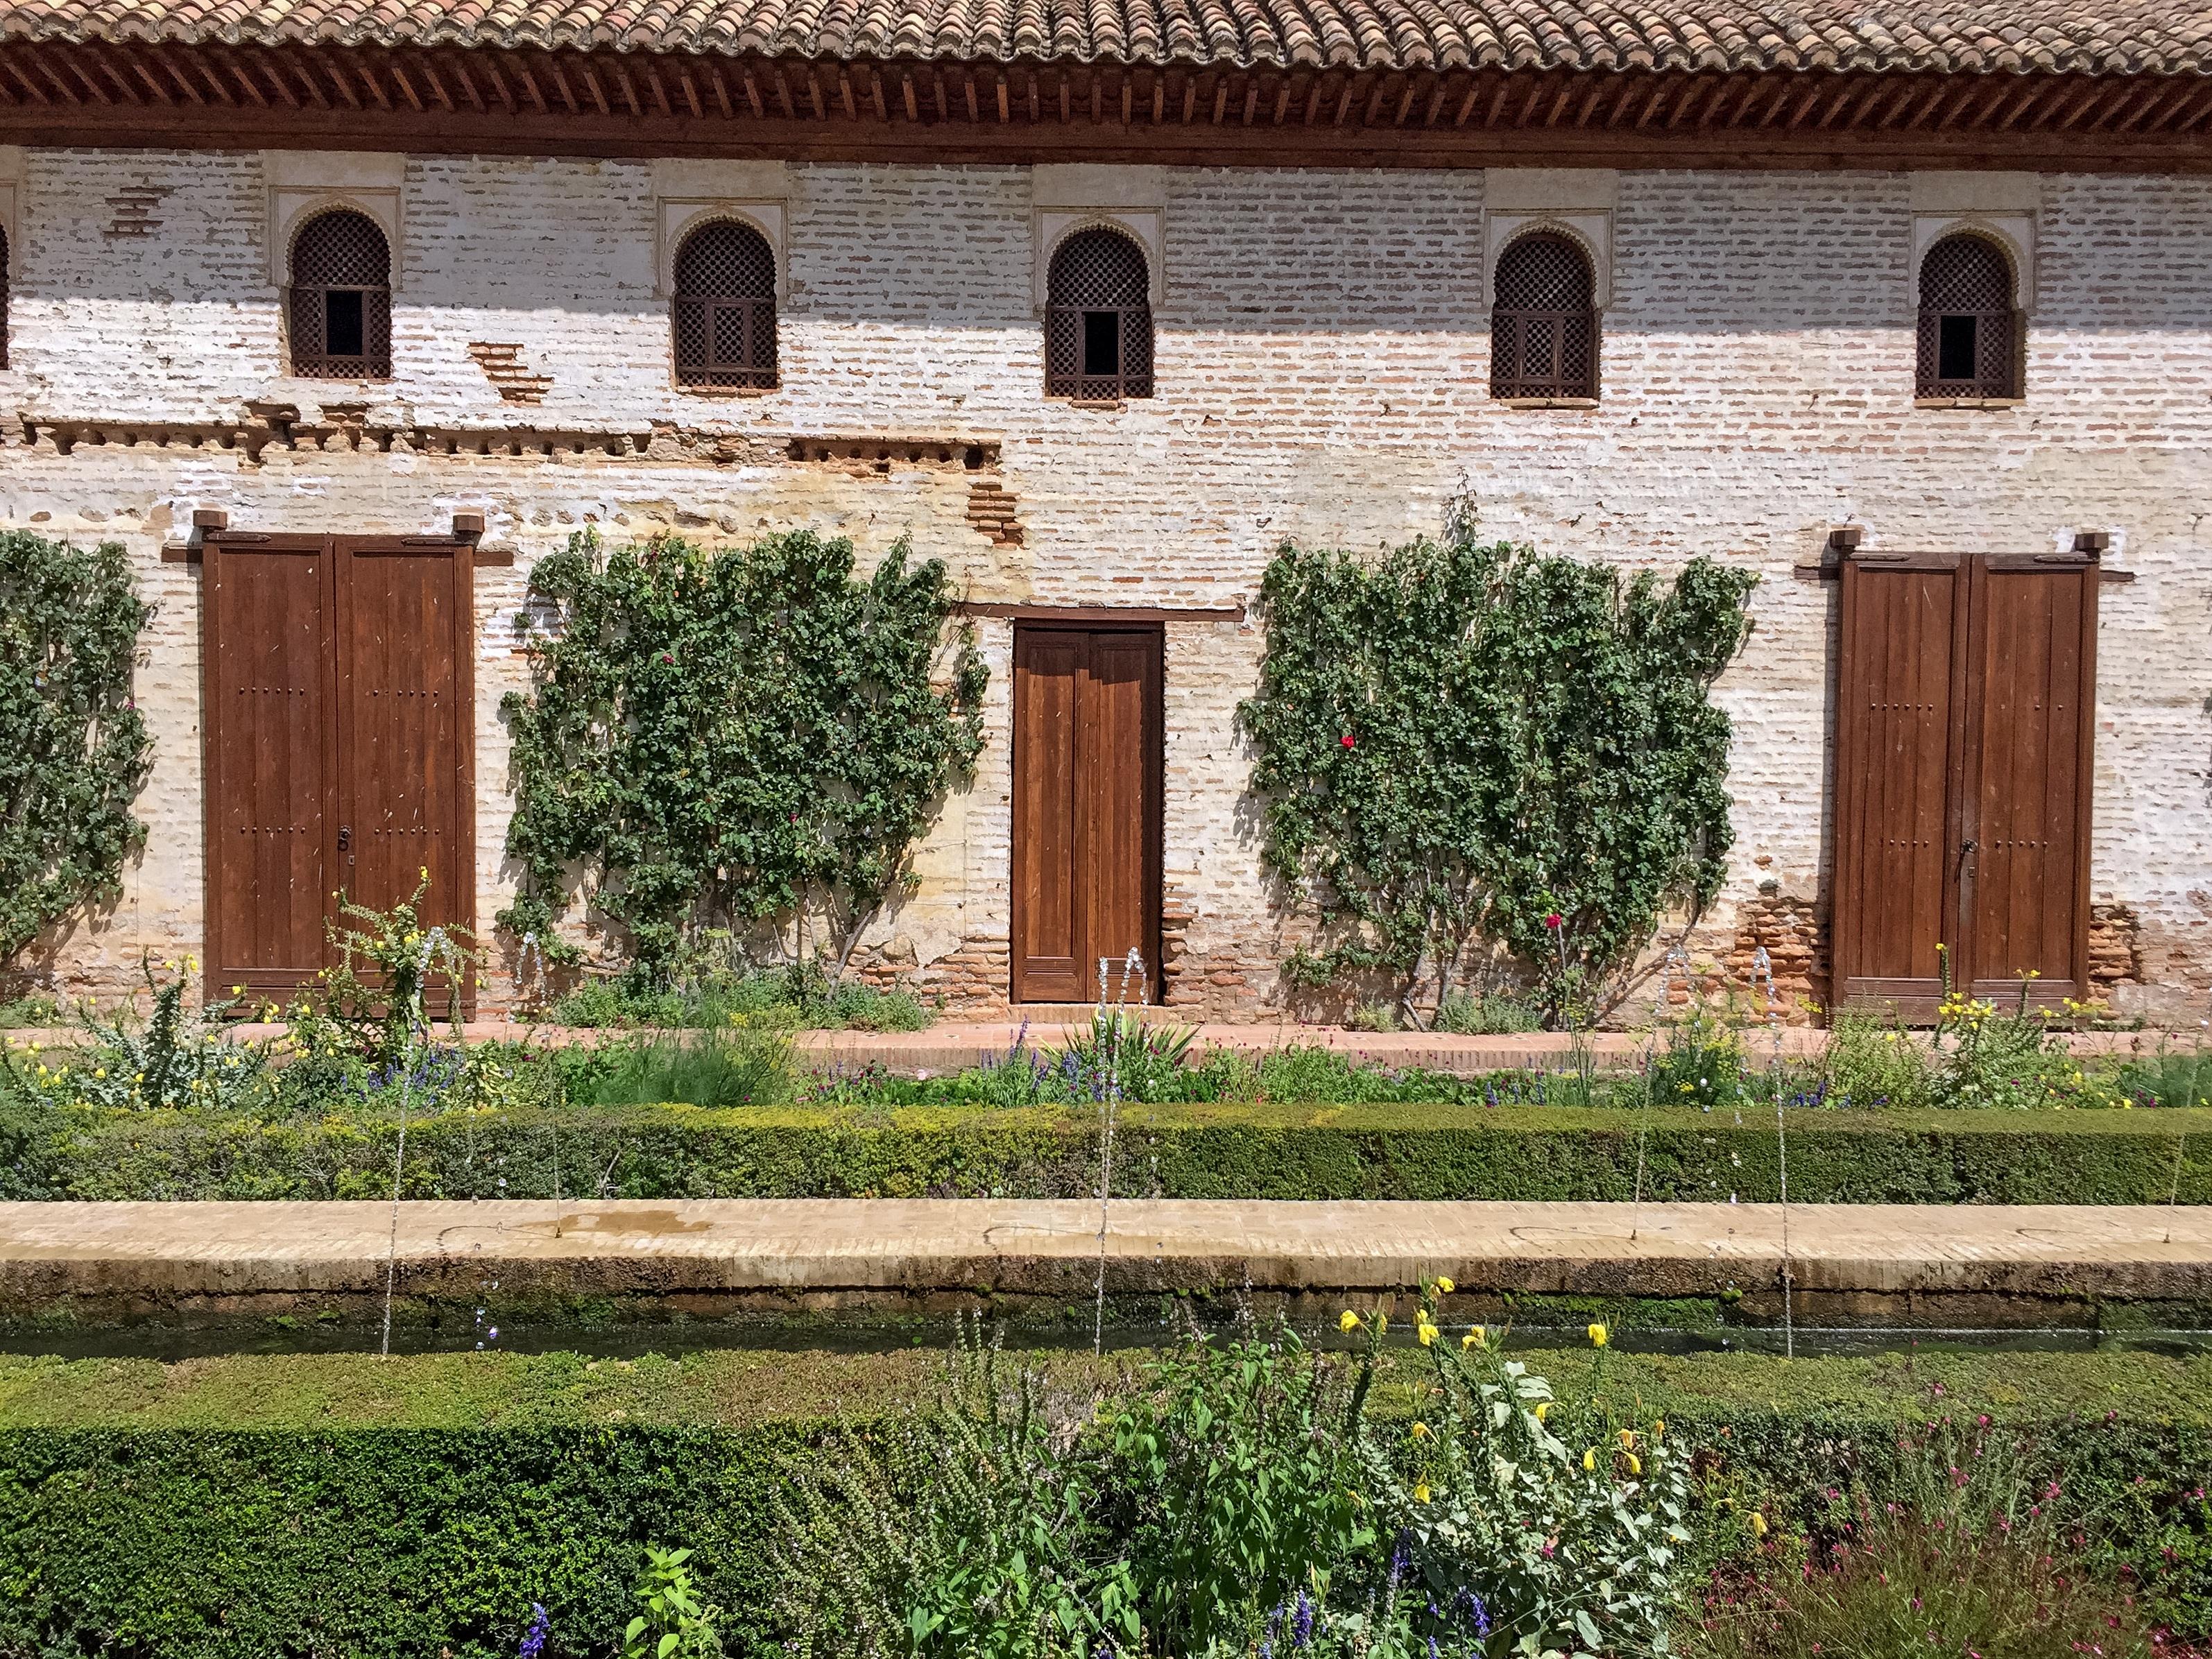 Gambar Air Pagar Rumah Bangunan Lumbung Dinding Gudang